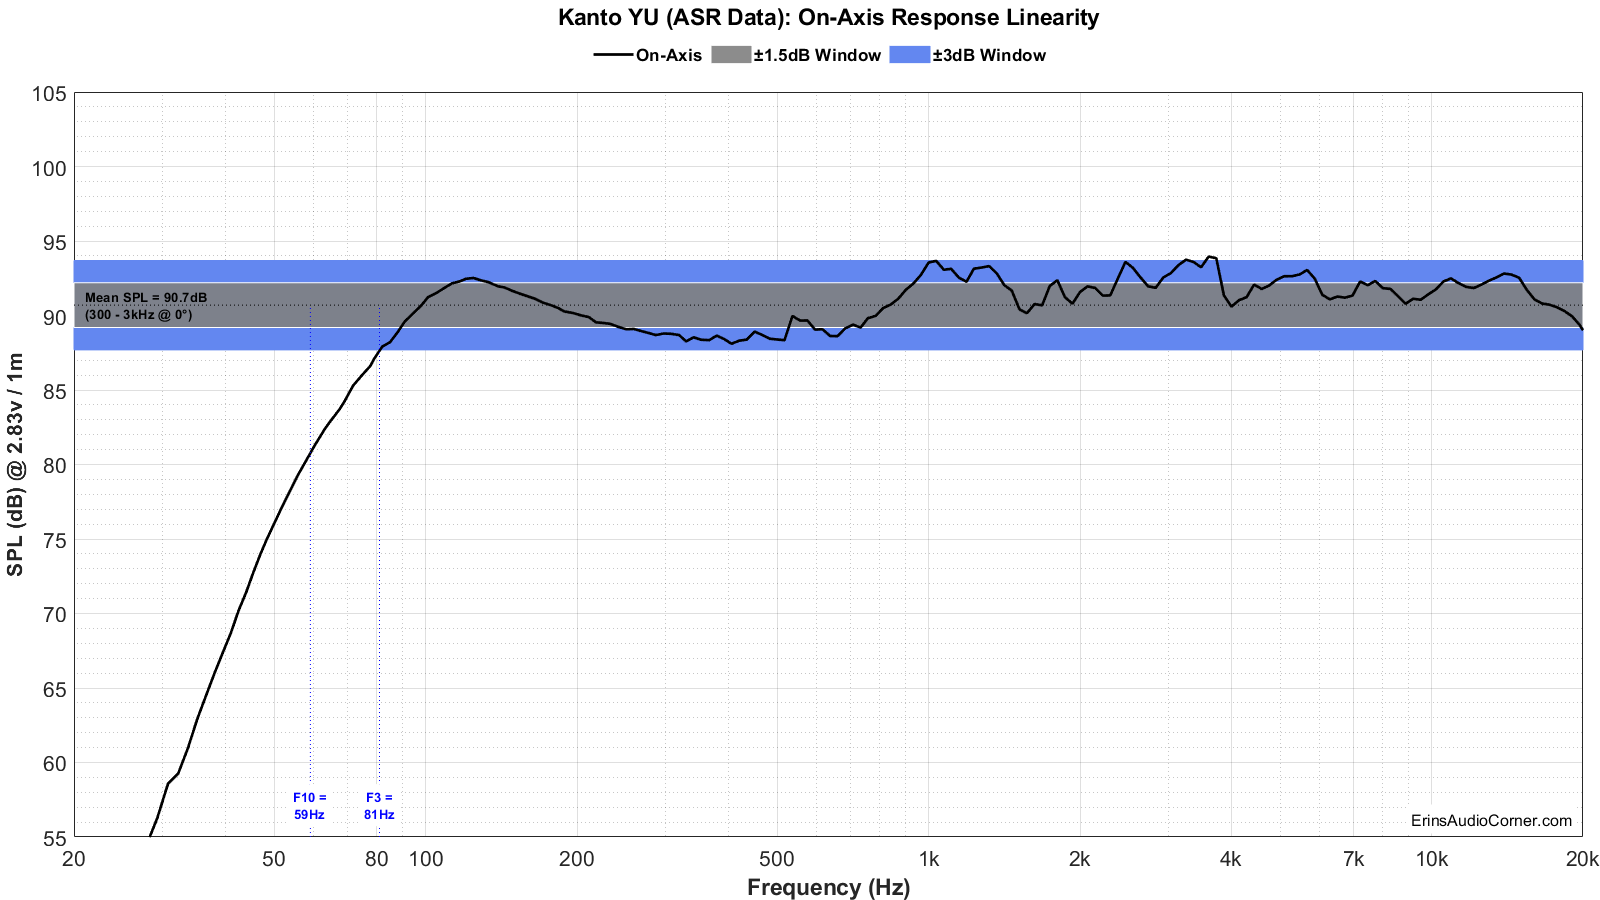 Kanto YU (ASR Data) FR_Linearity.png